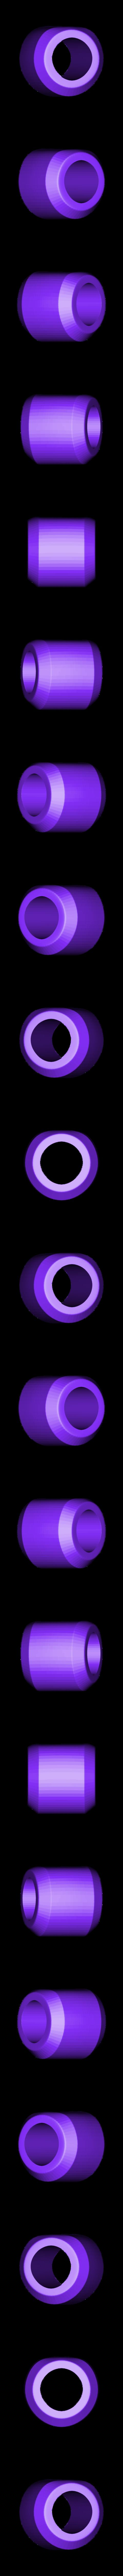 Lucio_hoseMntA.stl Download free STL file Overwatch Lucio Blaster • 3D printer object, Adafruit